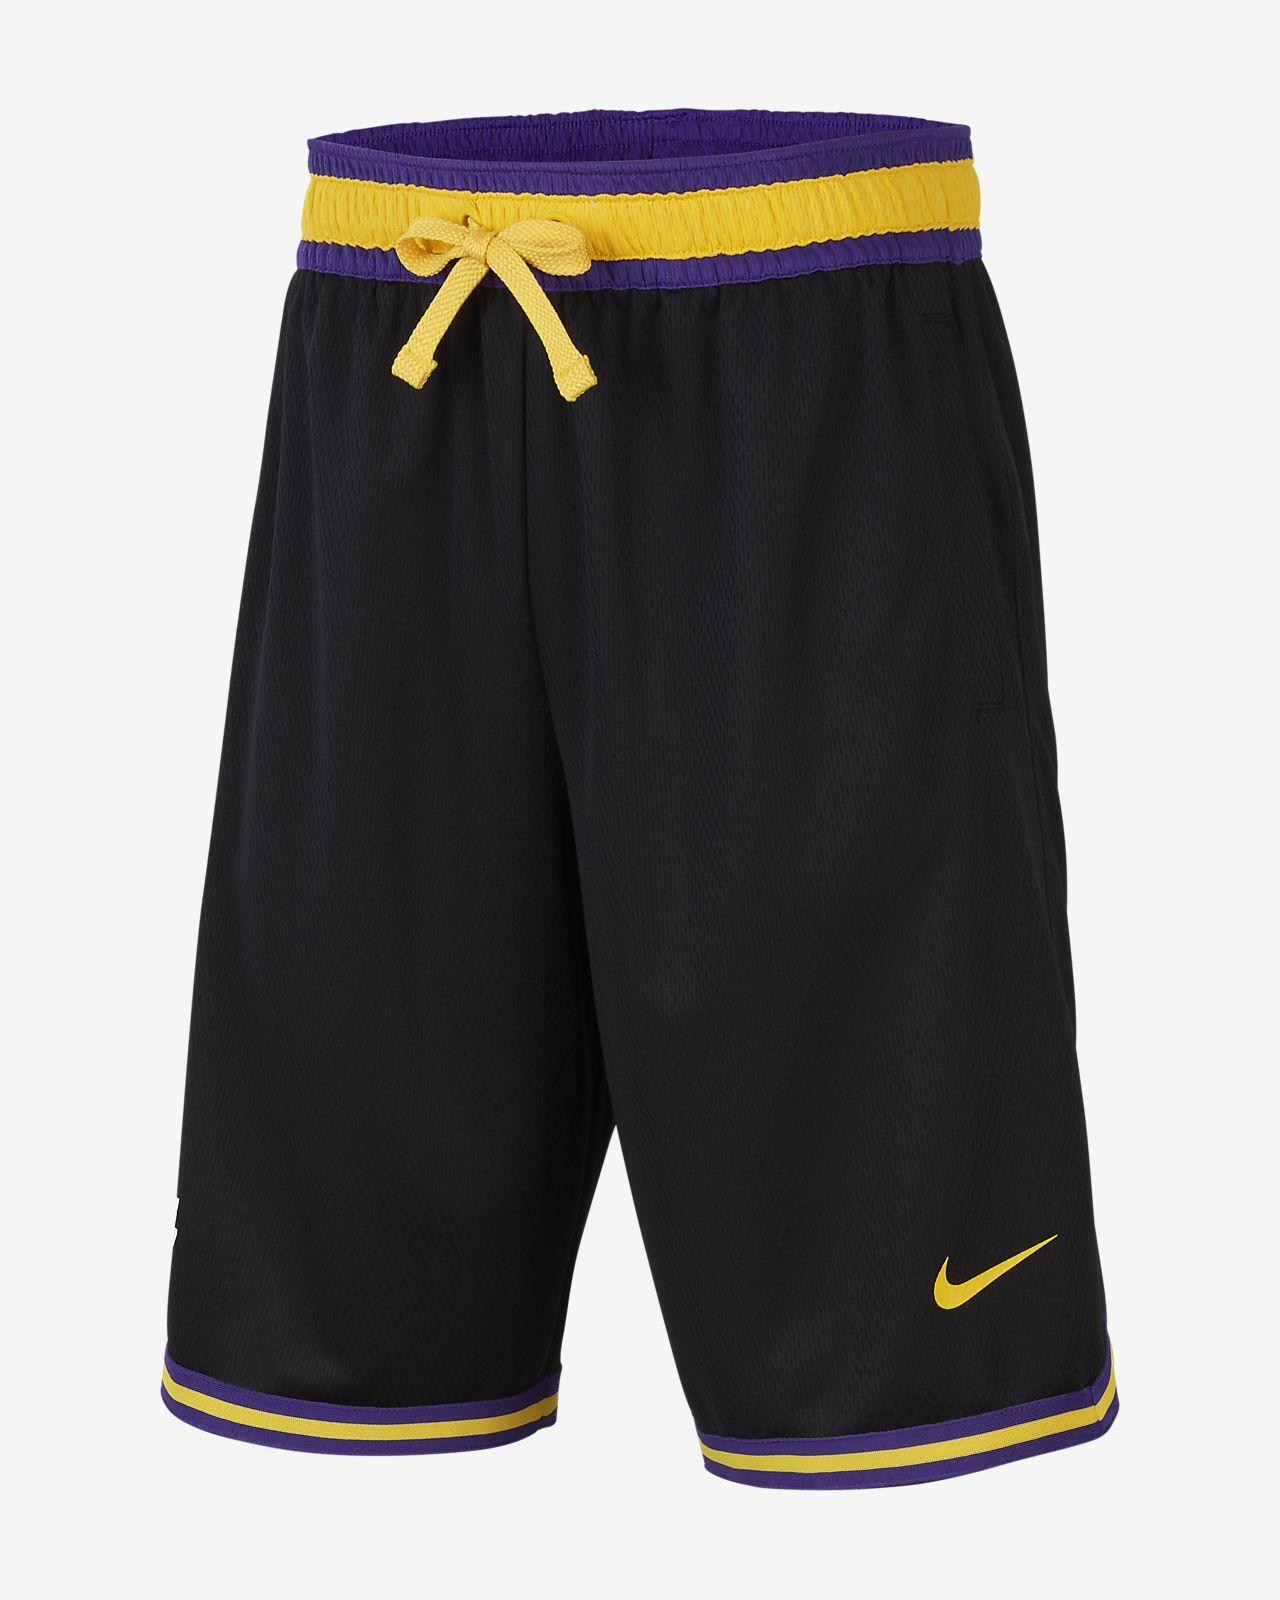 Lakers DNA Pantalón corto Nike NBA - Niño/a